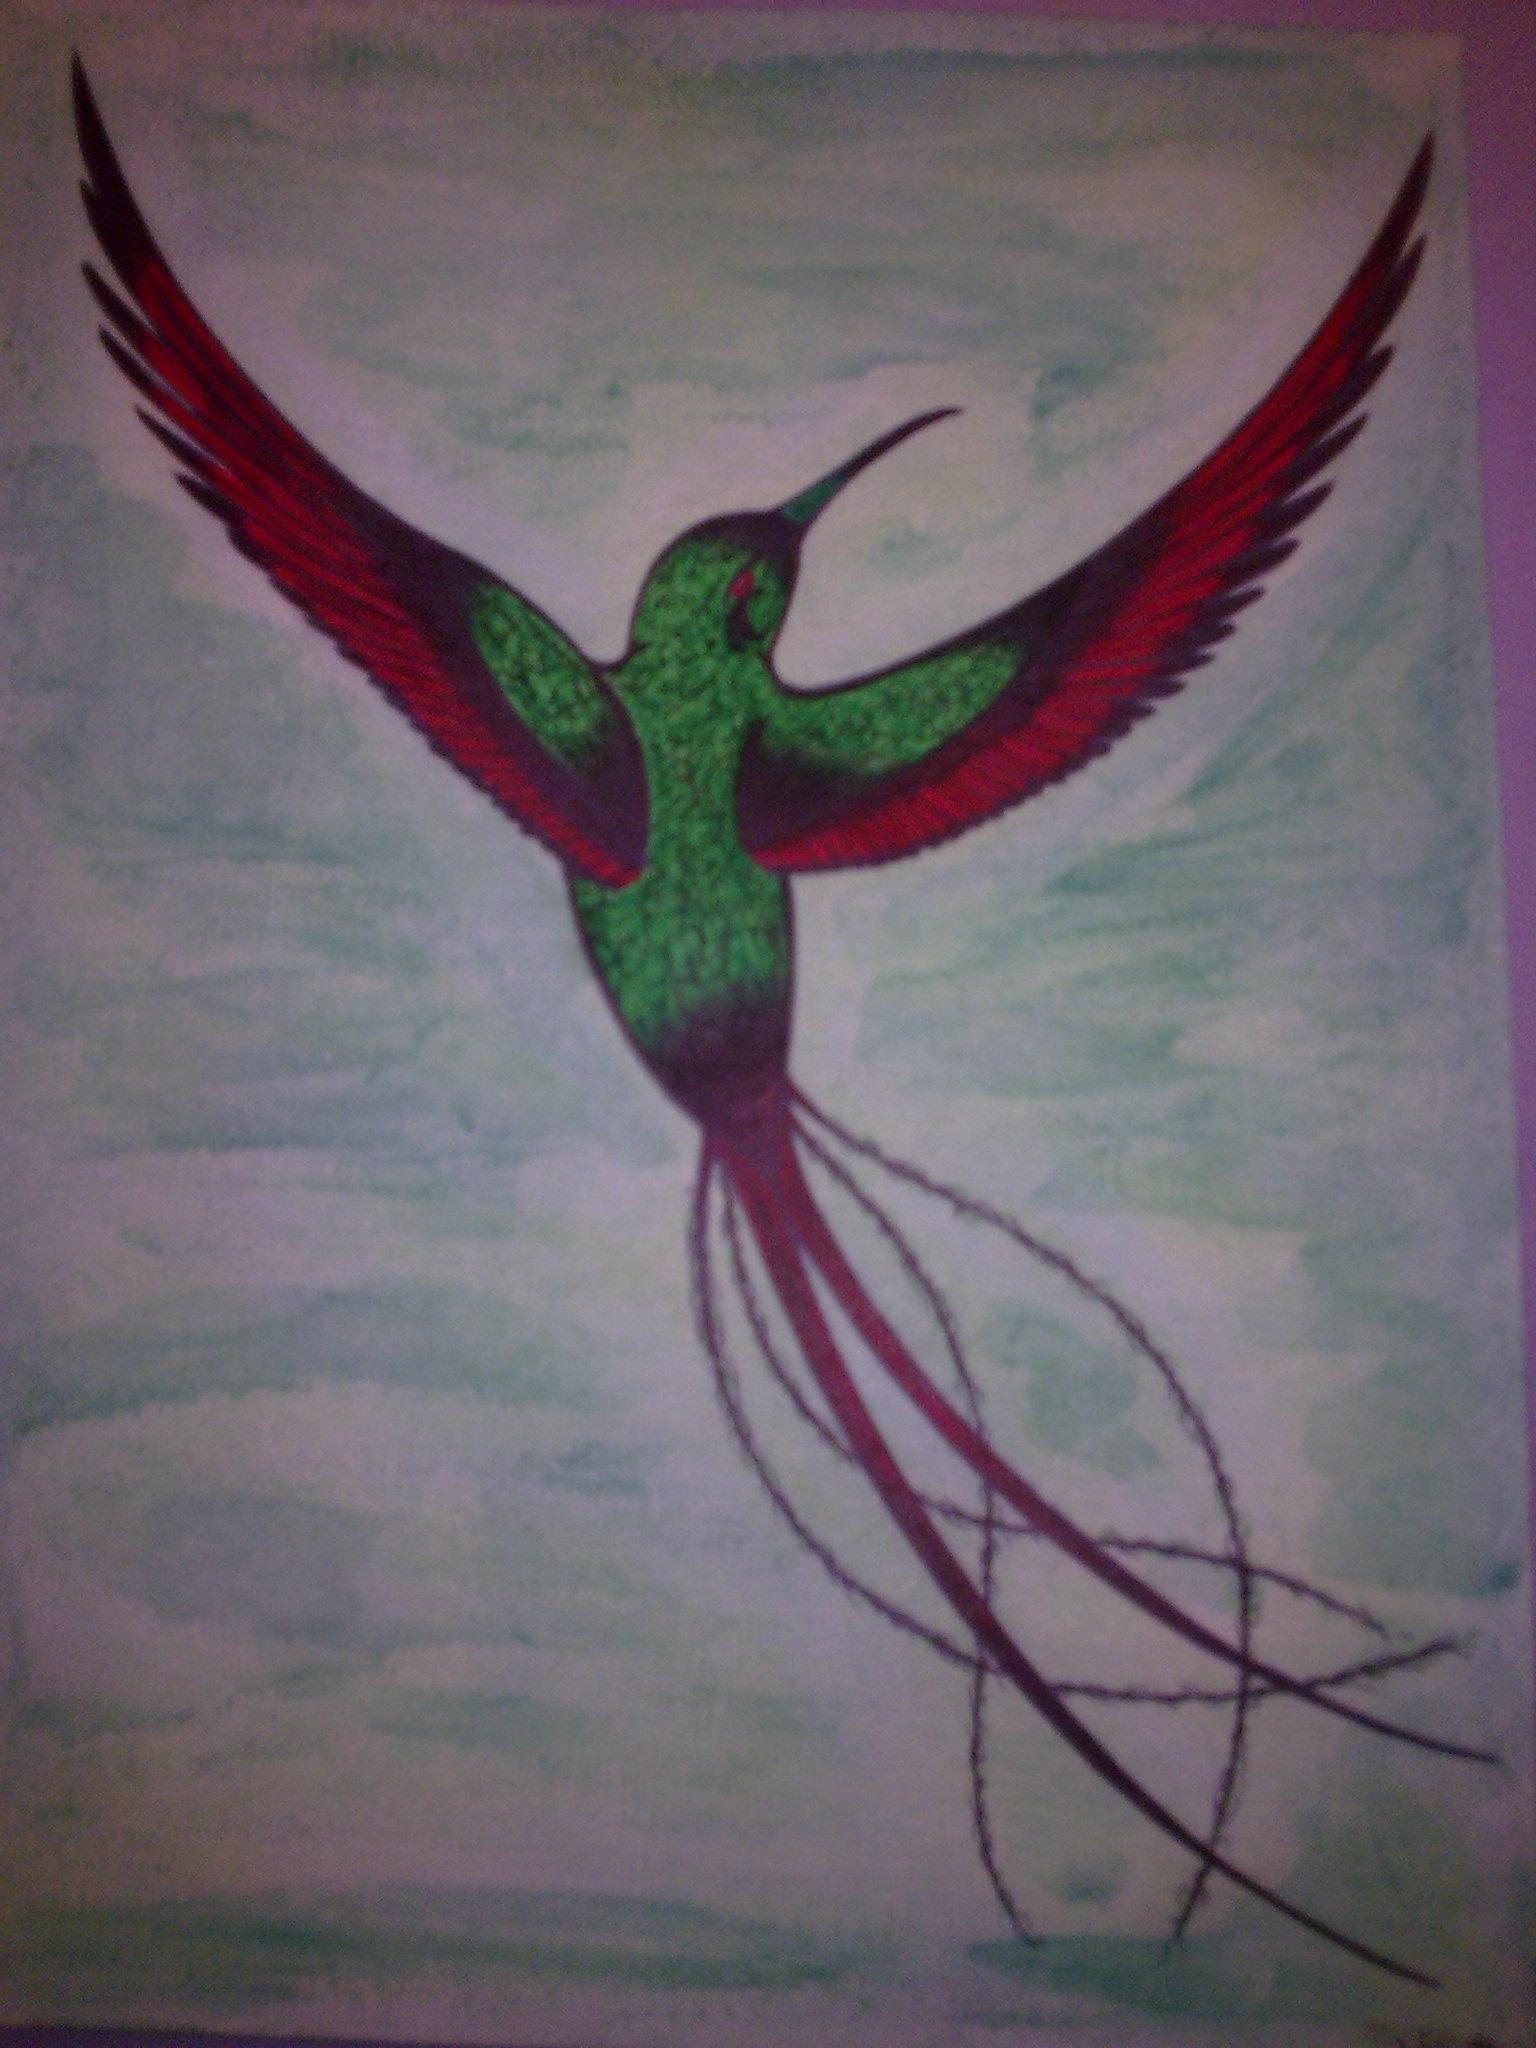 tatouage gwada le tatouage des iles tatouages de colibri et fleur d 39 hibiscus tattoo gwada. Black Bedroom Furniture Sets. Home Design Ideas